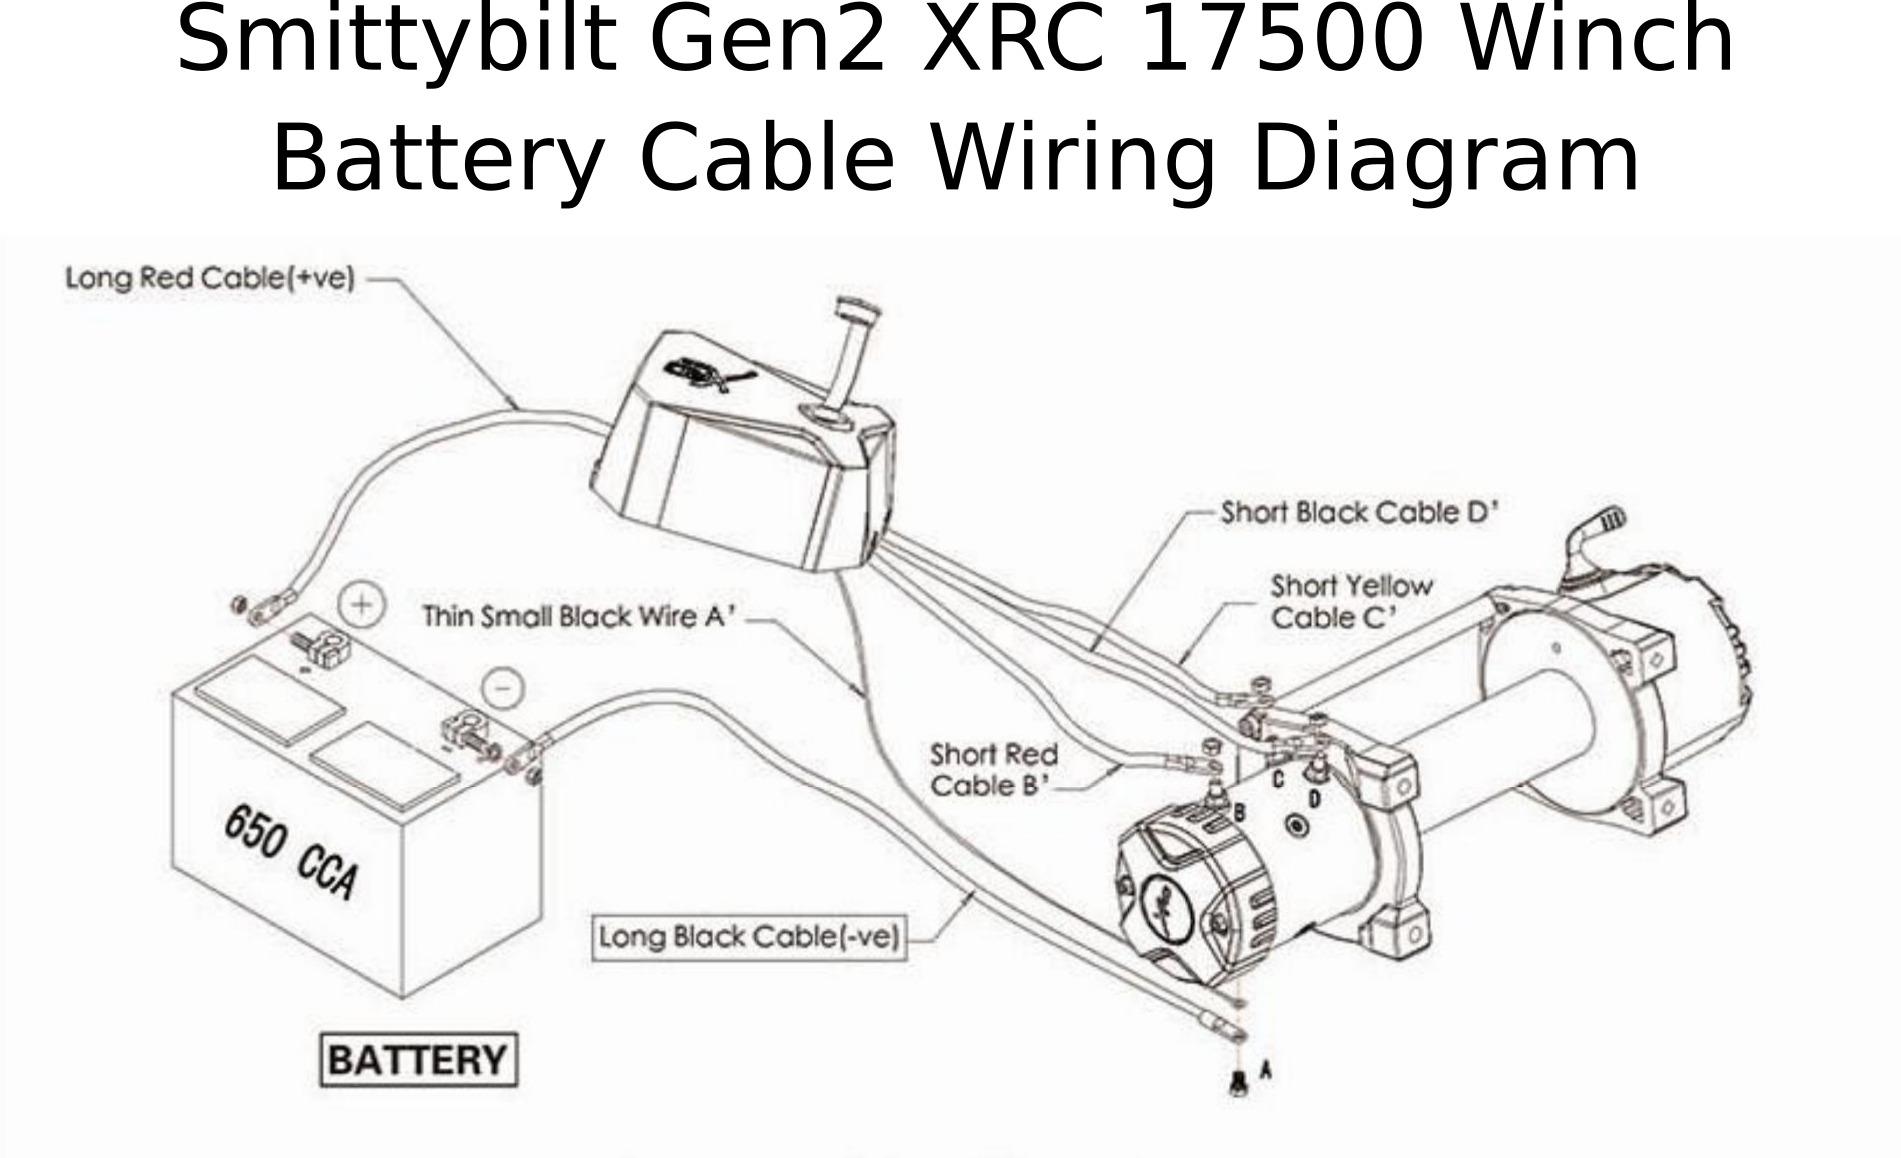 Smittybilt Gen2 Xrc Winch Specs